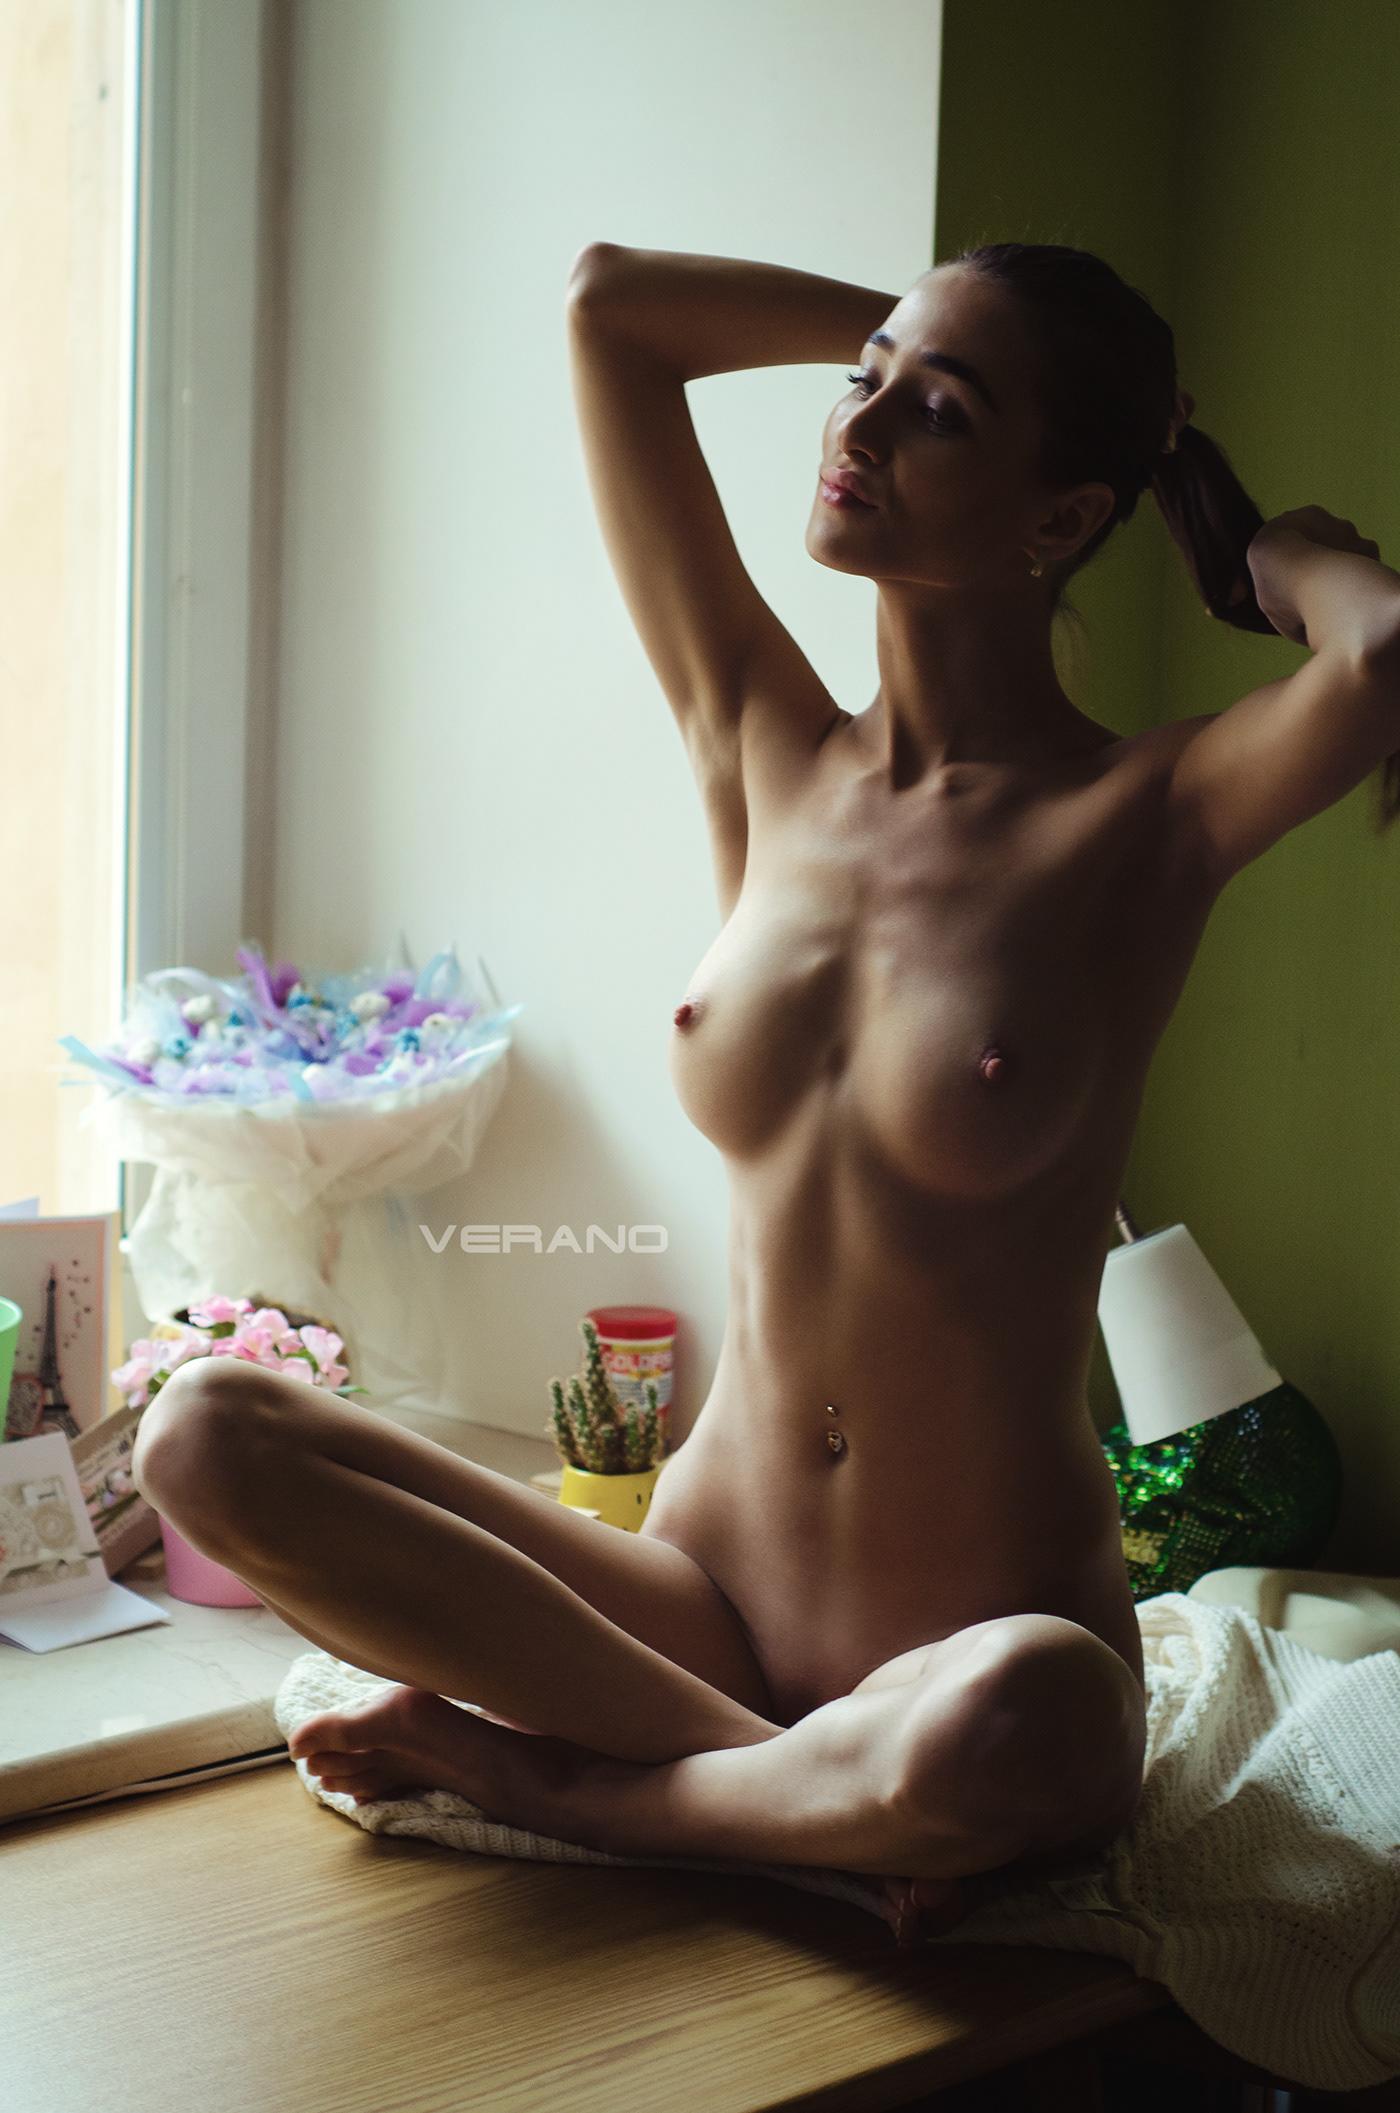 Светлана / фотограф Nikolas Verano